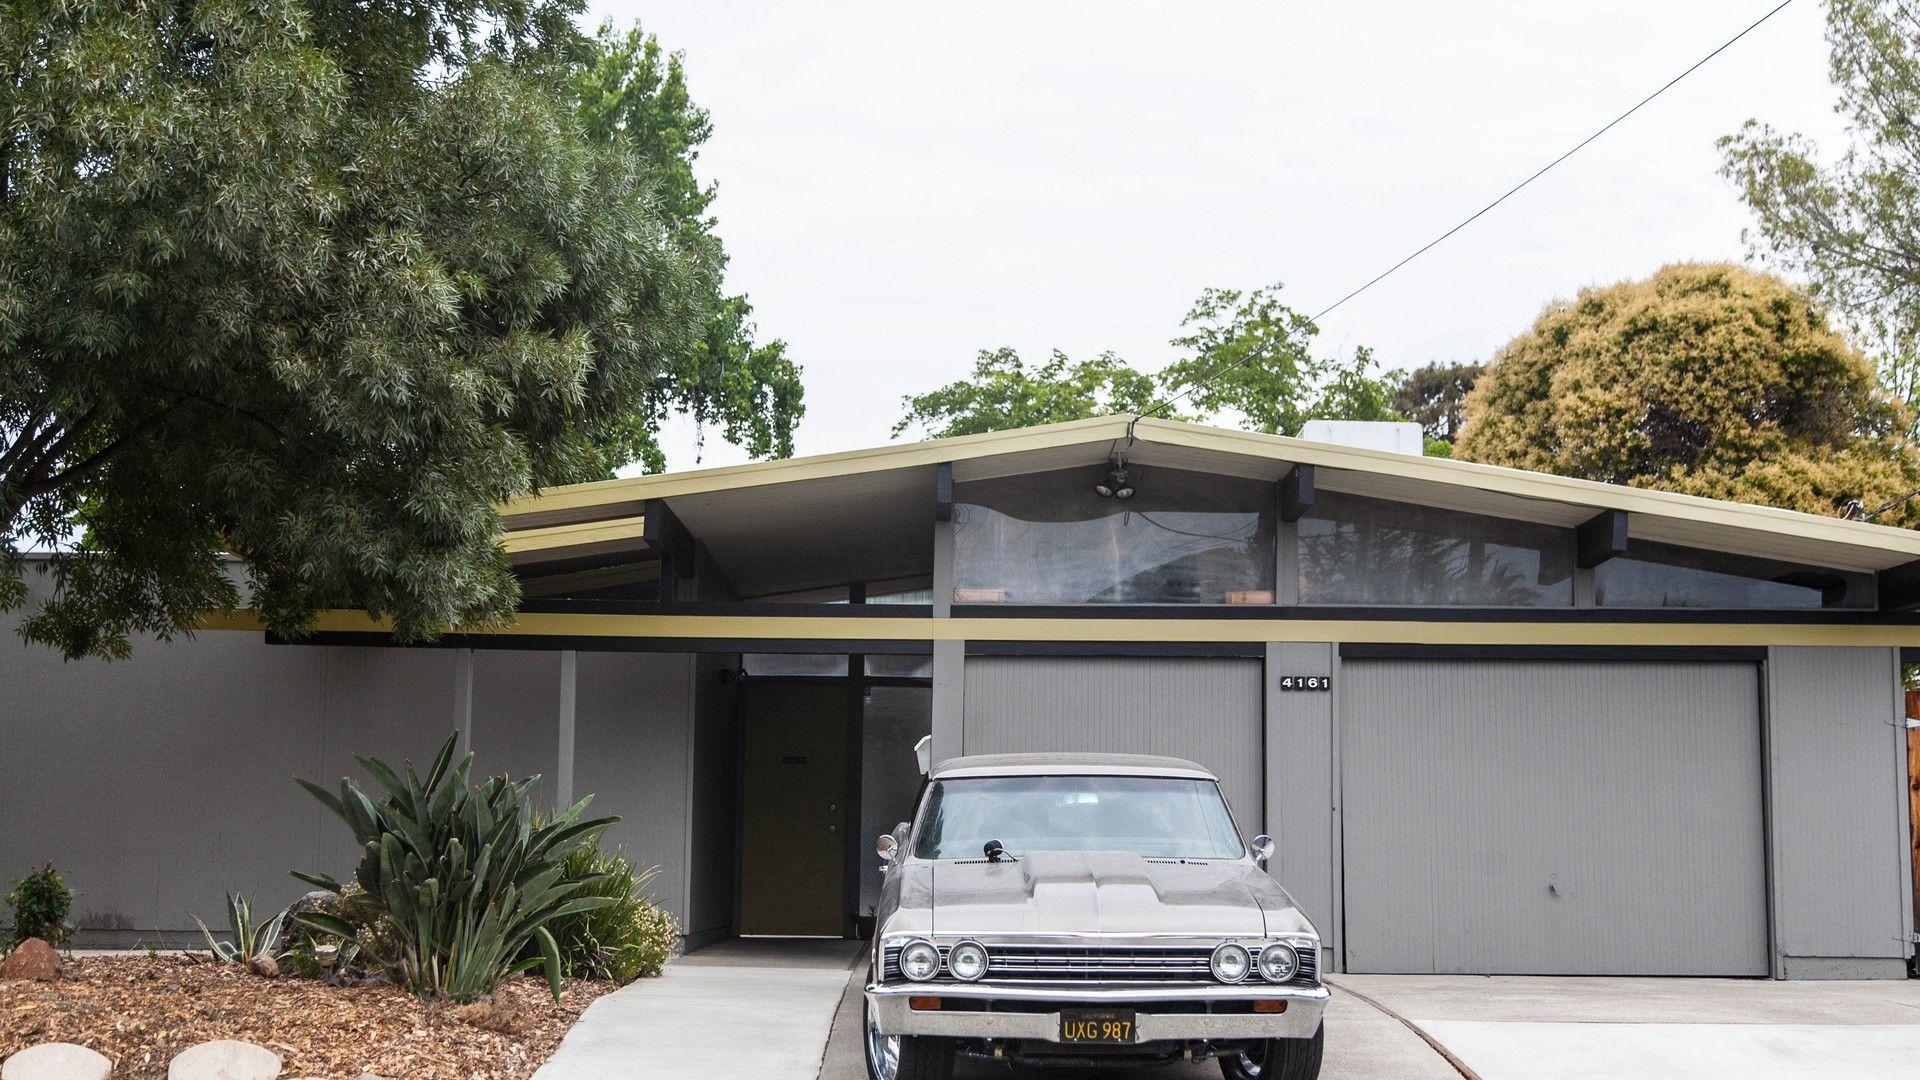 Concord Eichler Homes East Bay Eichlers Eichler For Sale California Modern Modern Homes Mid Century Modern Homes Eichler Homes Architecture Home